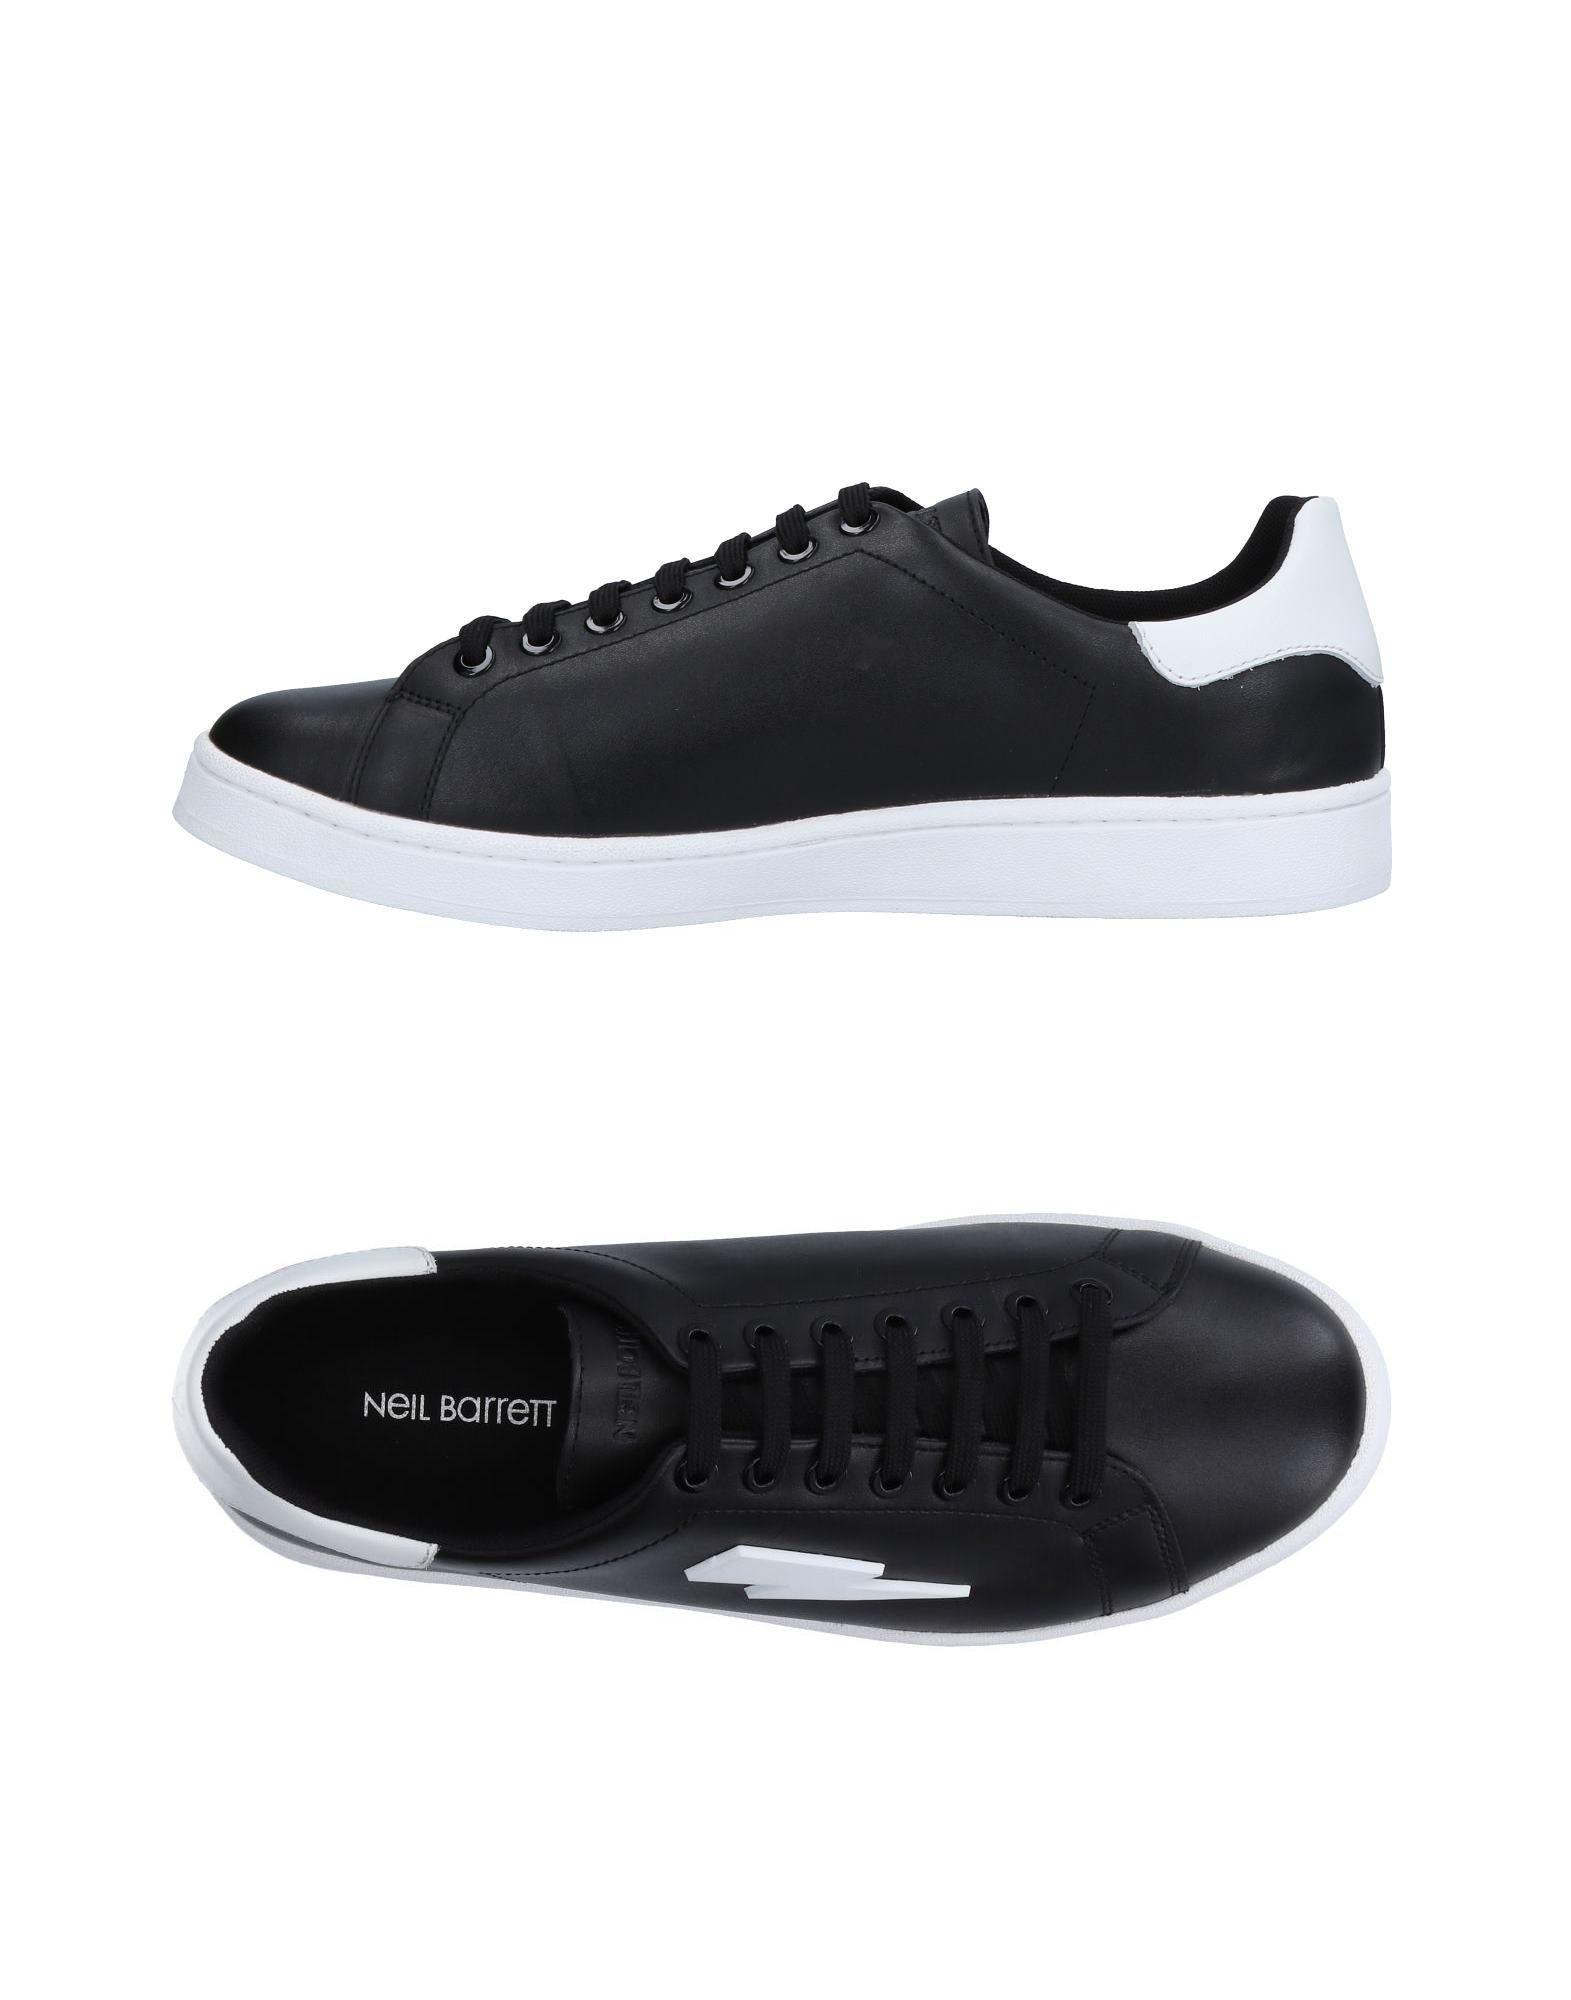 Neil Barrett Sneakers Herren  11522284OT Gute Qualität beliebte Schuhe